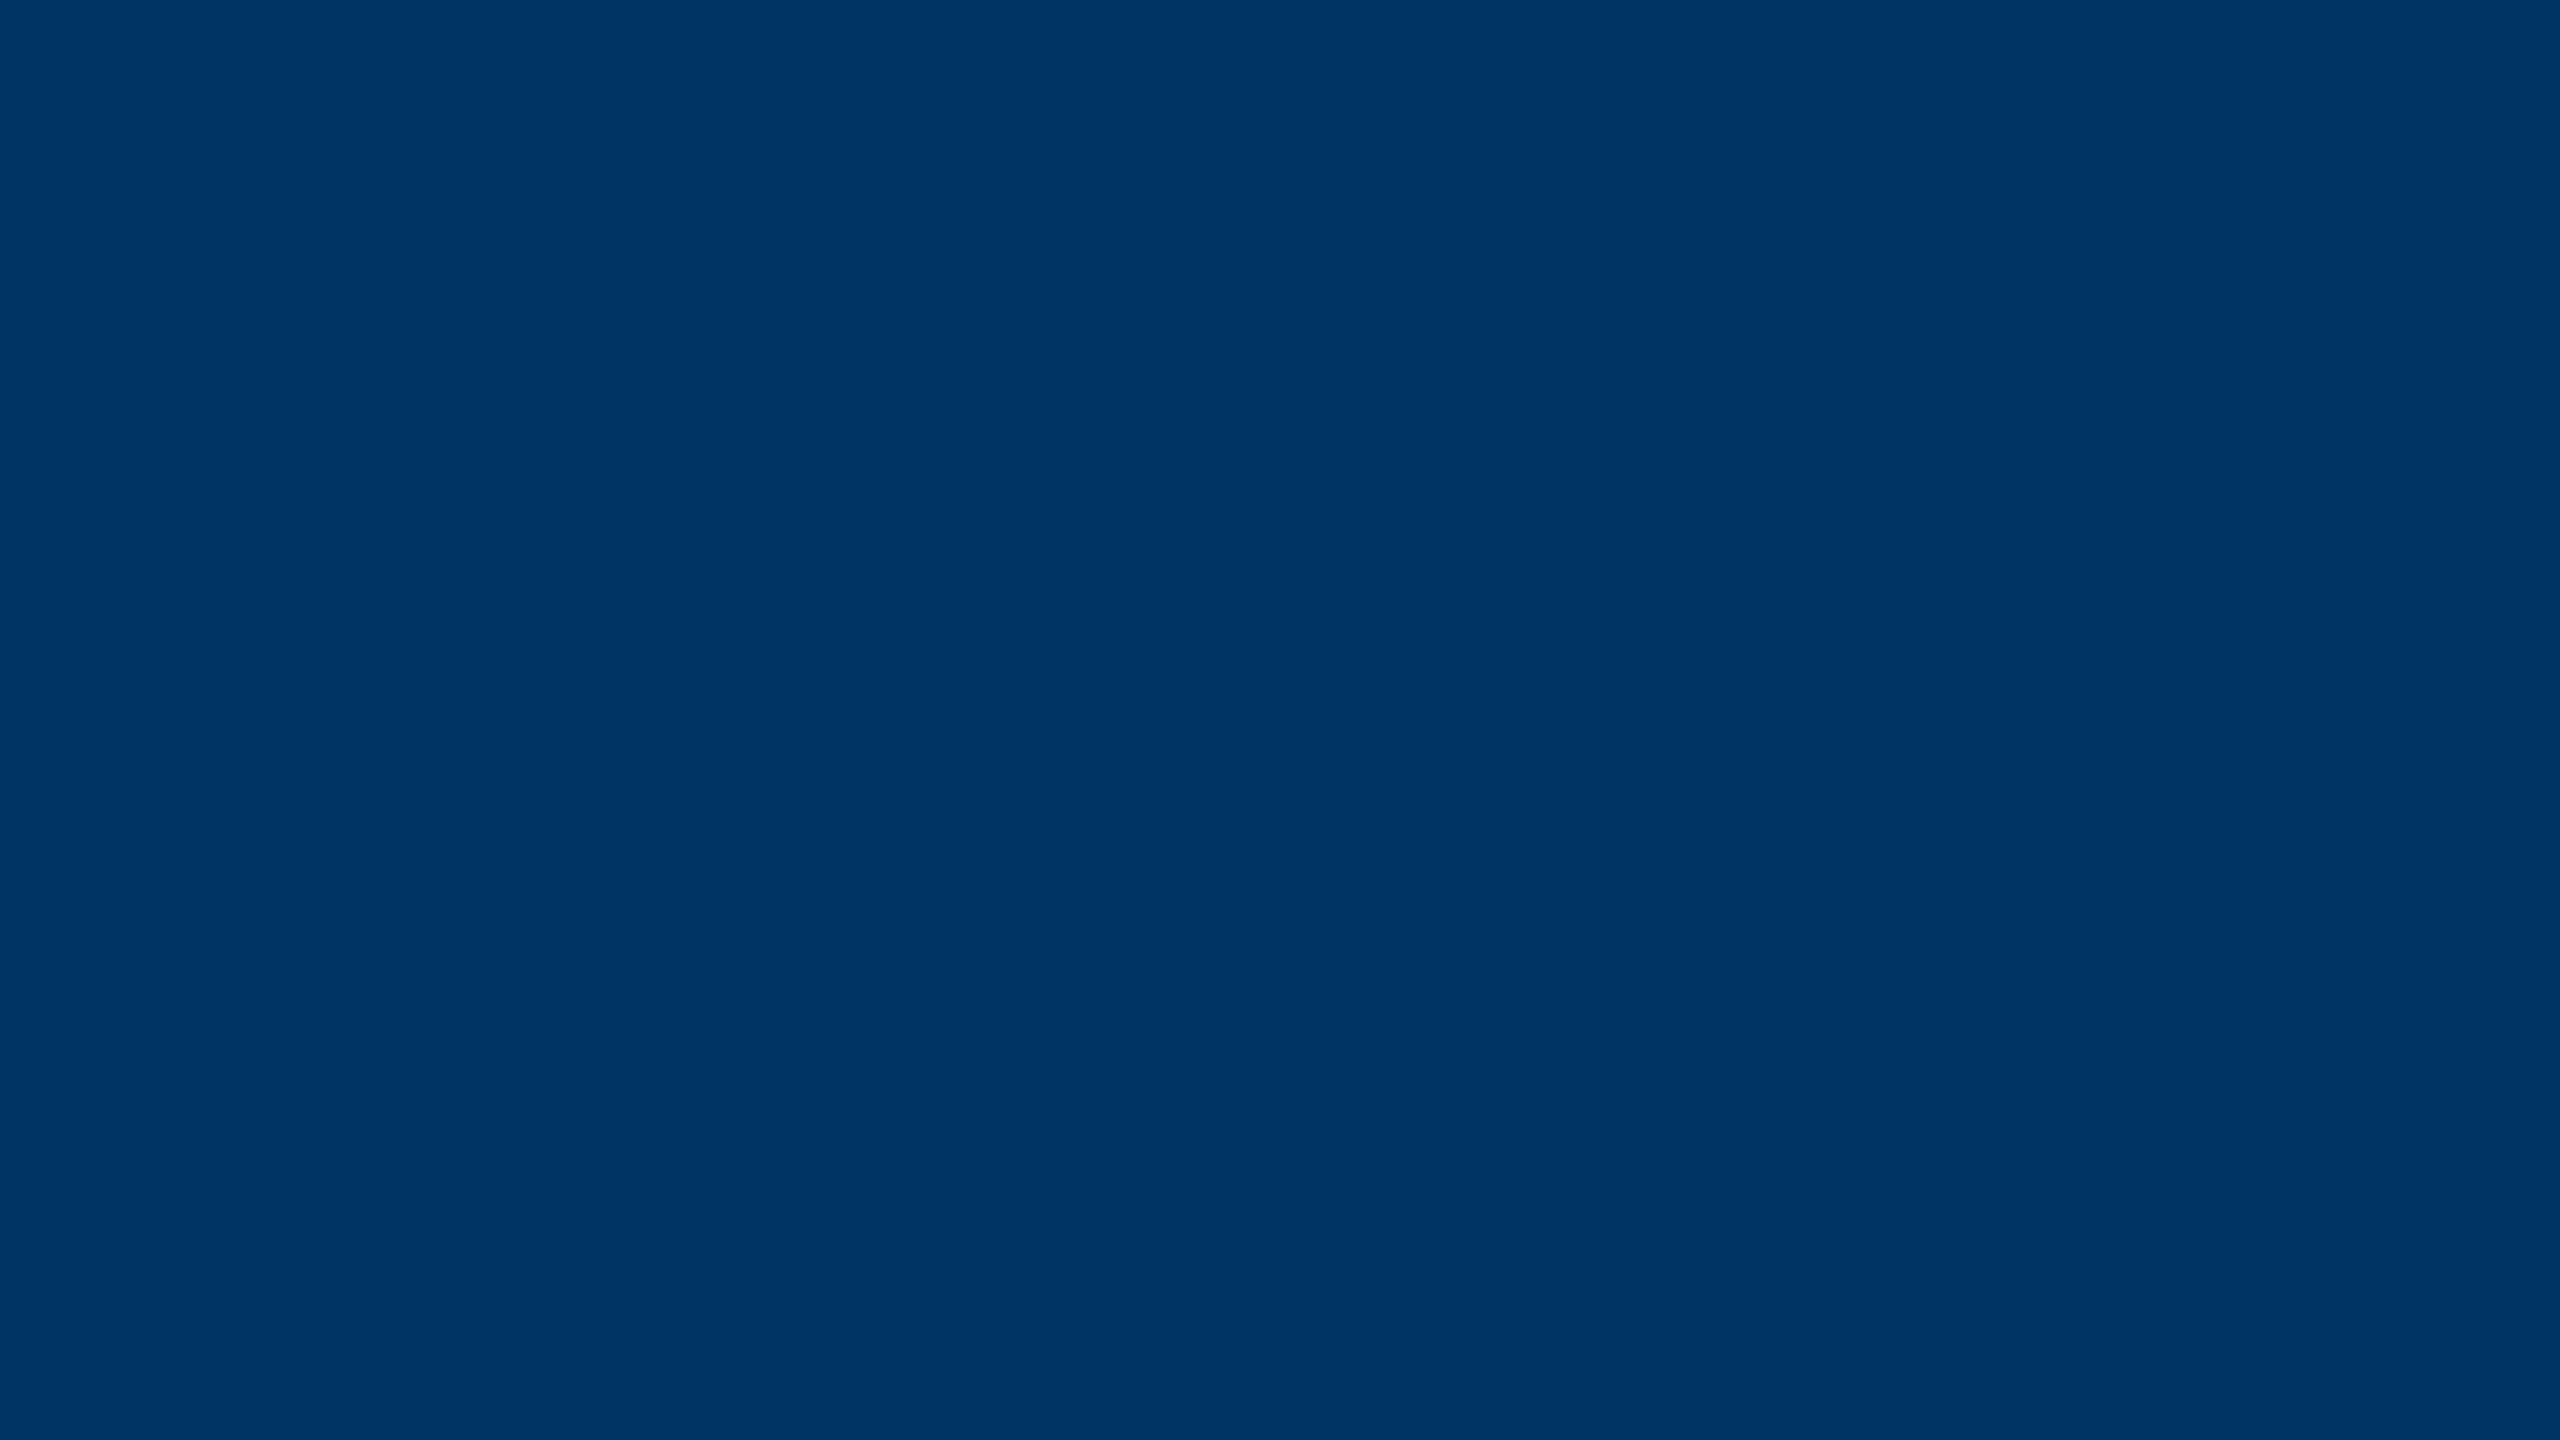 Solid Navy Blue Background Solid navy blu 2560x1440